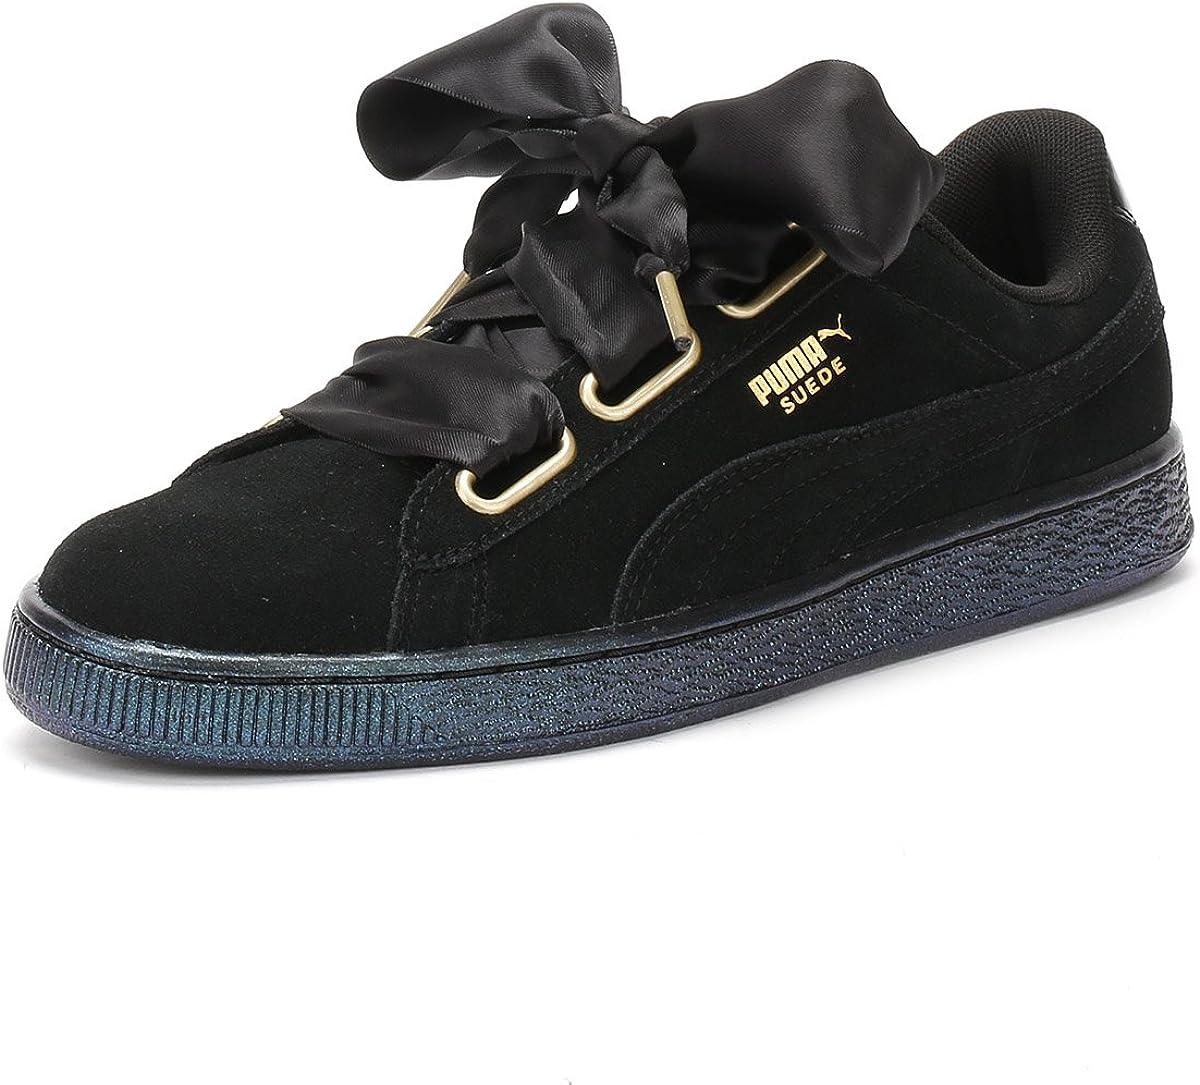 Puma Suede Heart Satin Womens Sneakers Black